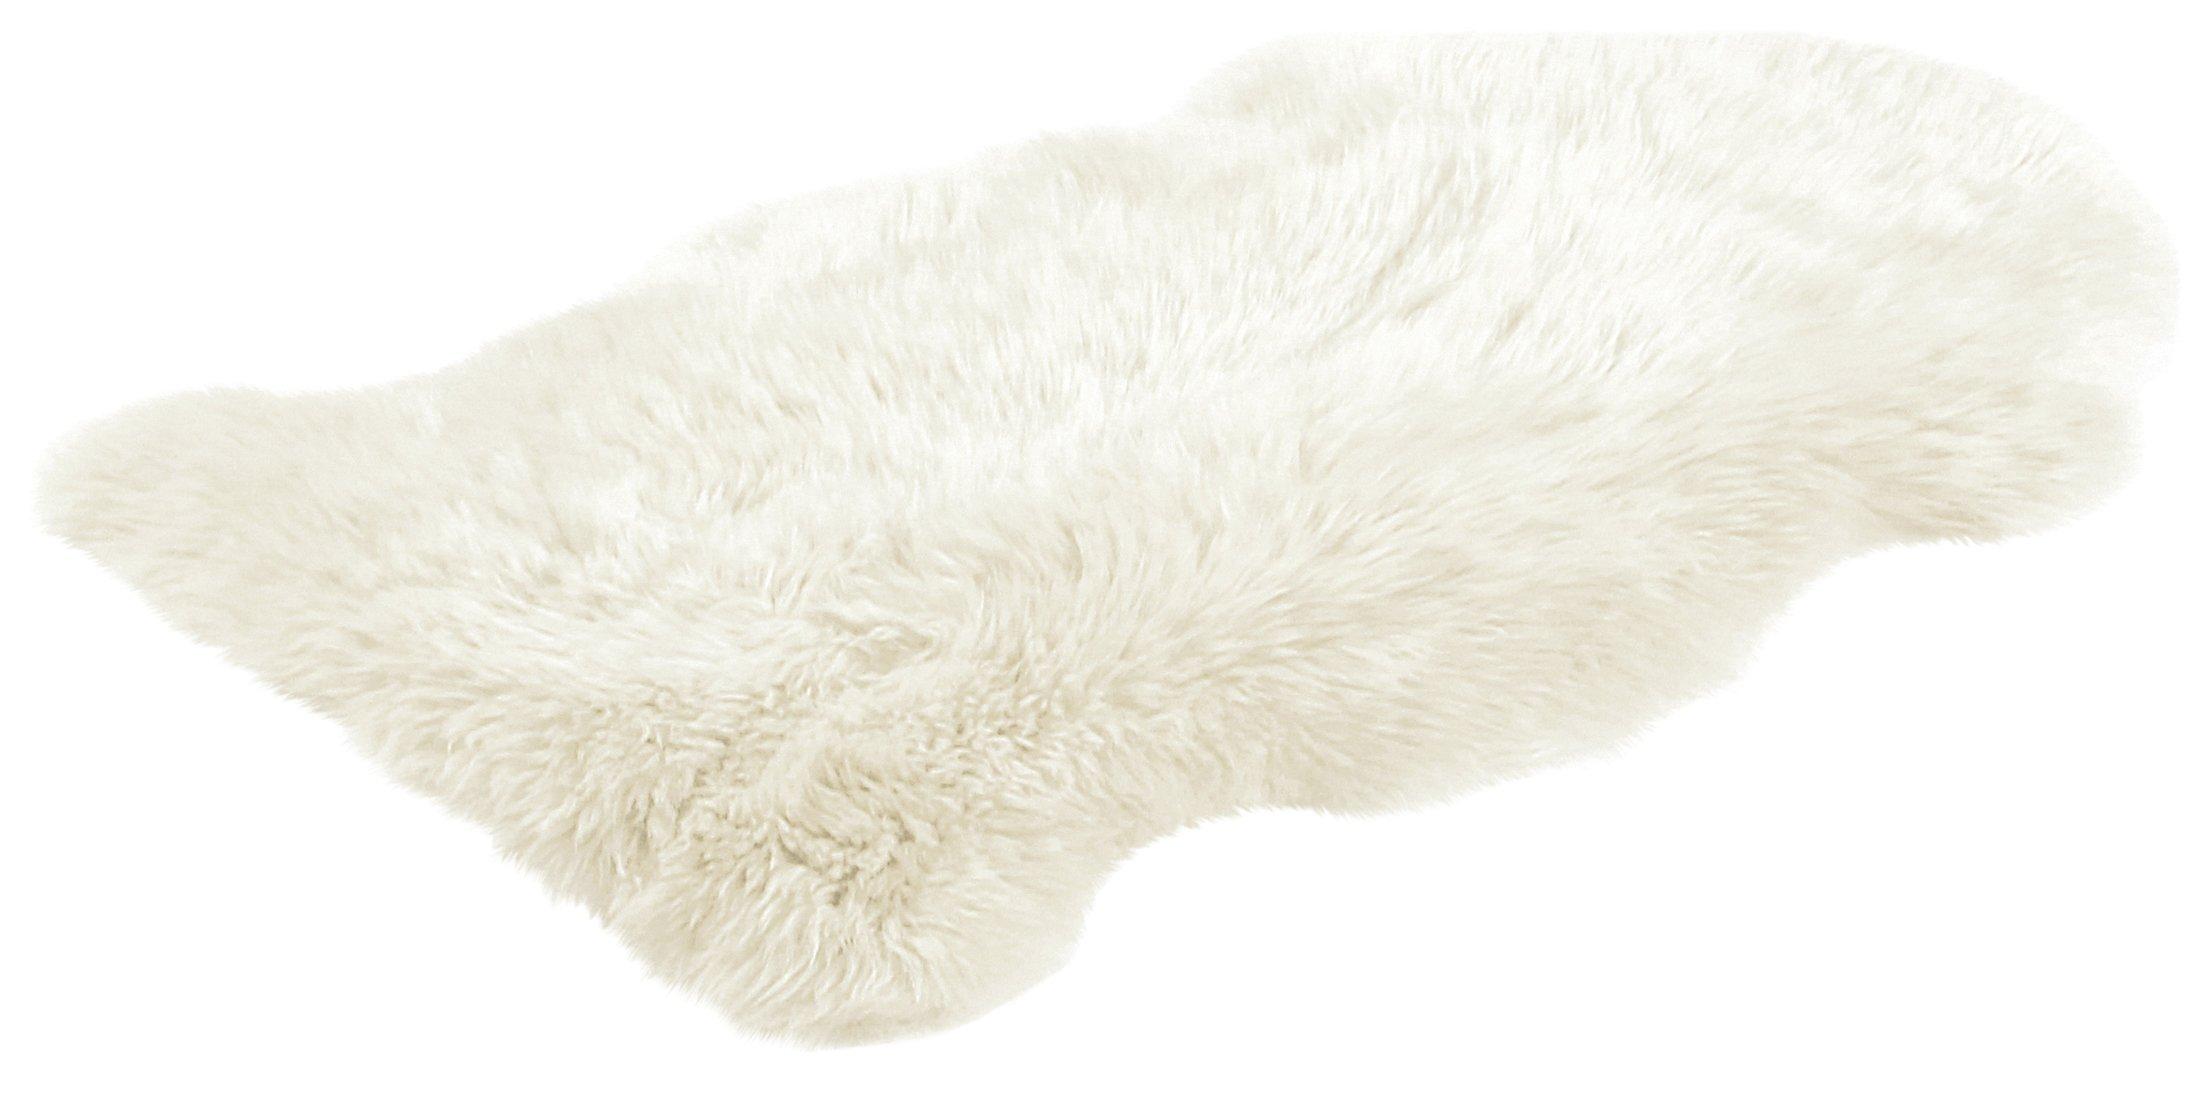 Image of Bowron Sheepskin Longwool Rug - 60x95cm - Ivory